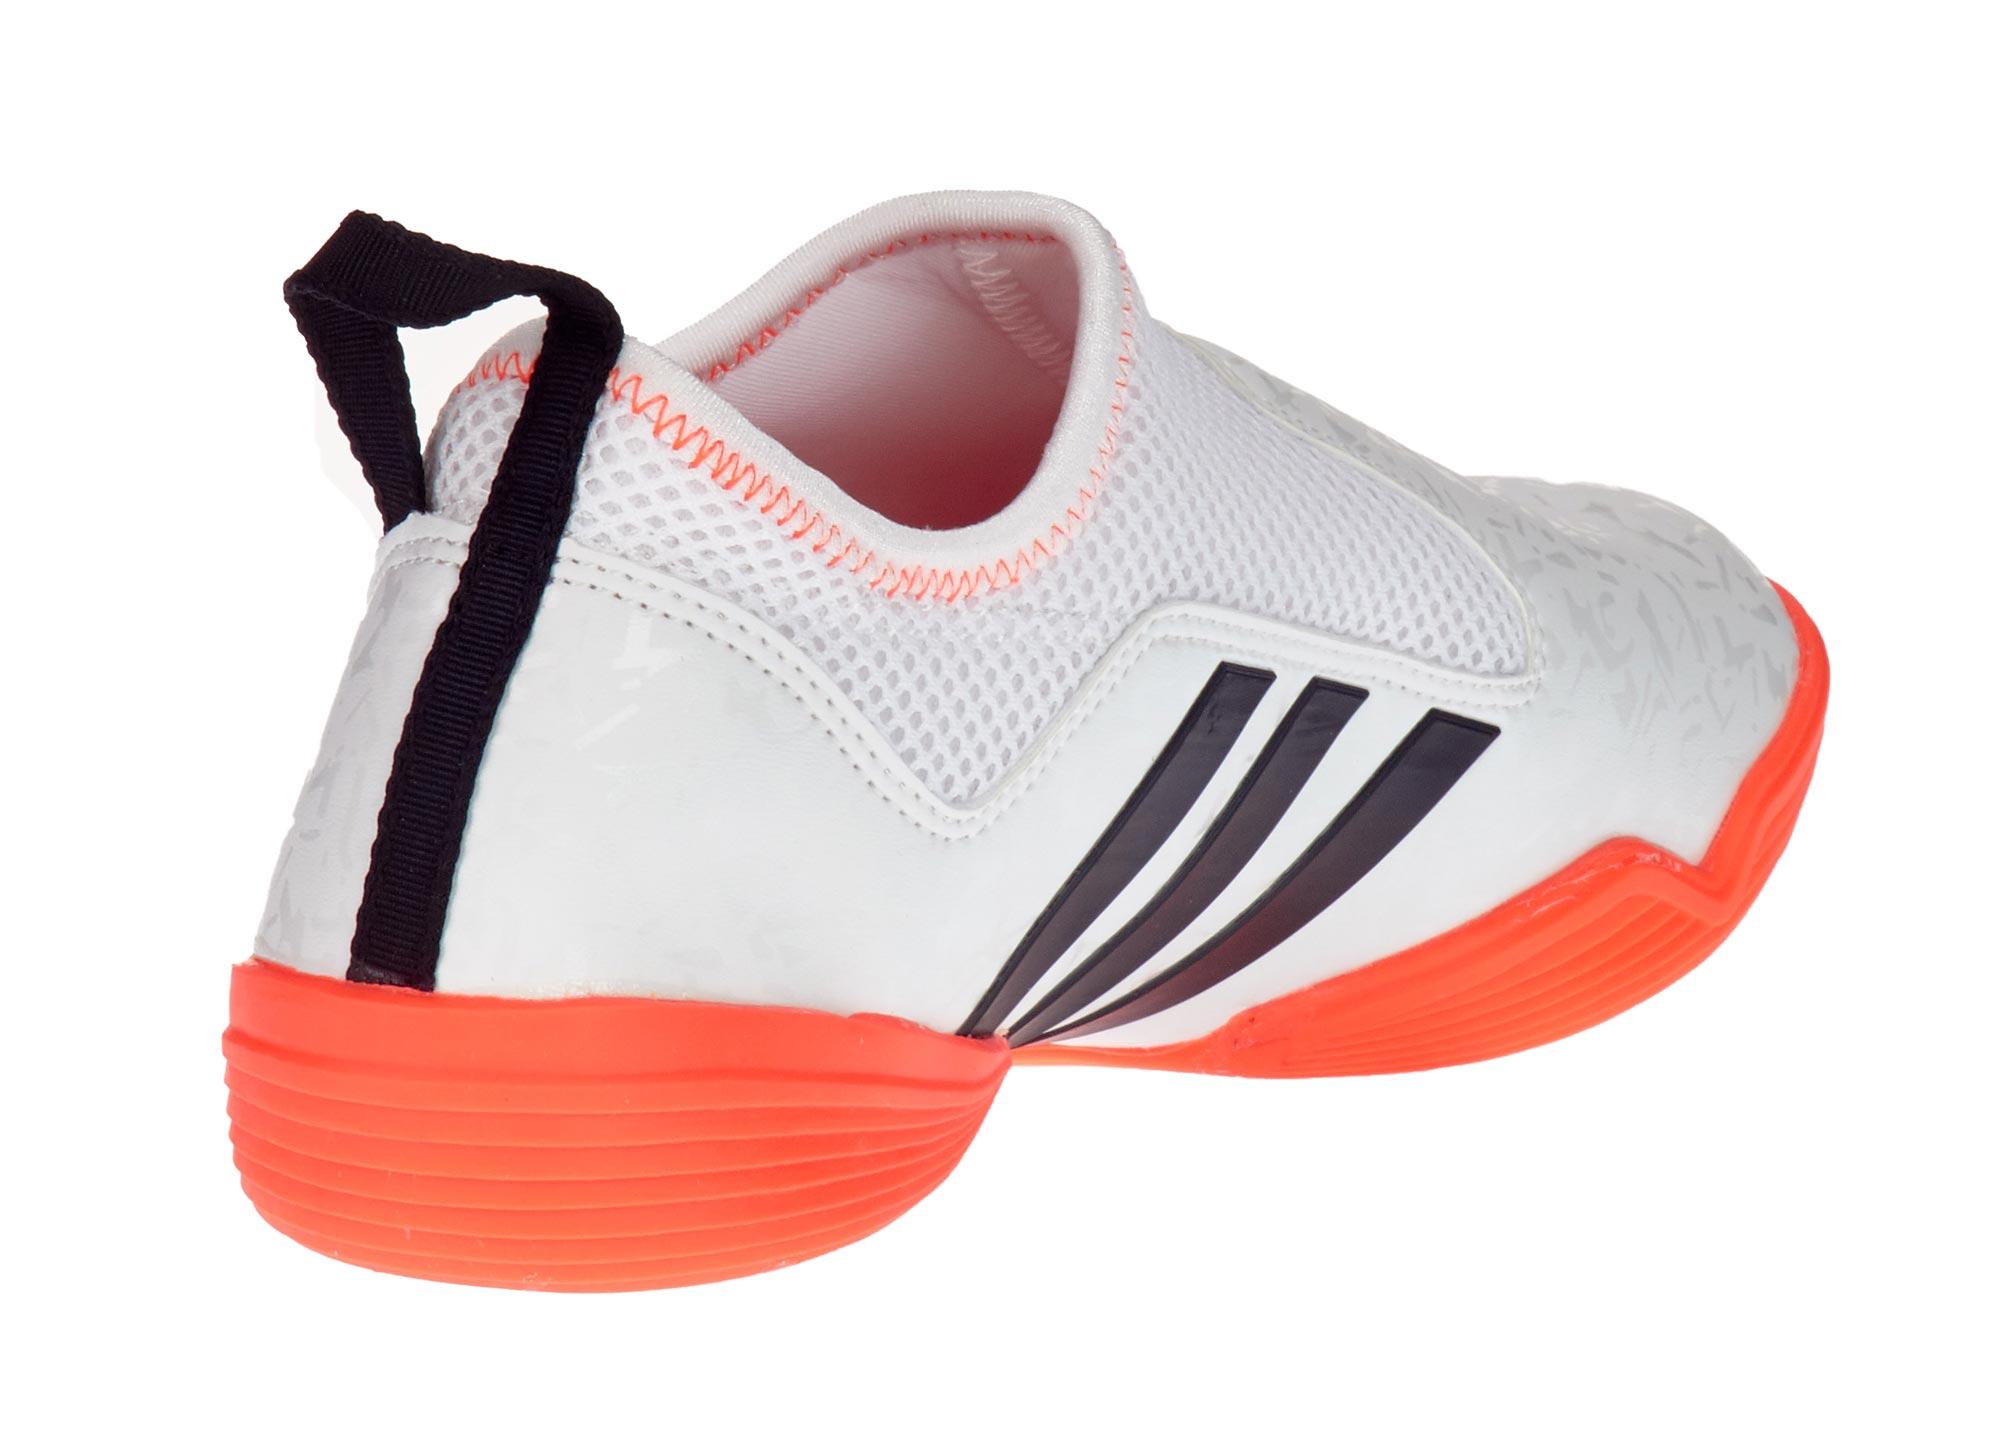 9cd6c6a192d9b2 ... ADITBR01 · Vorschau  adidas Sneaker